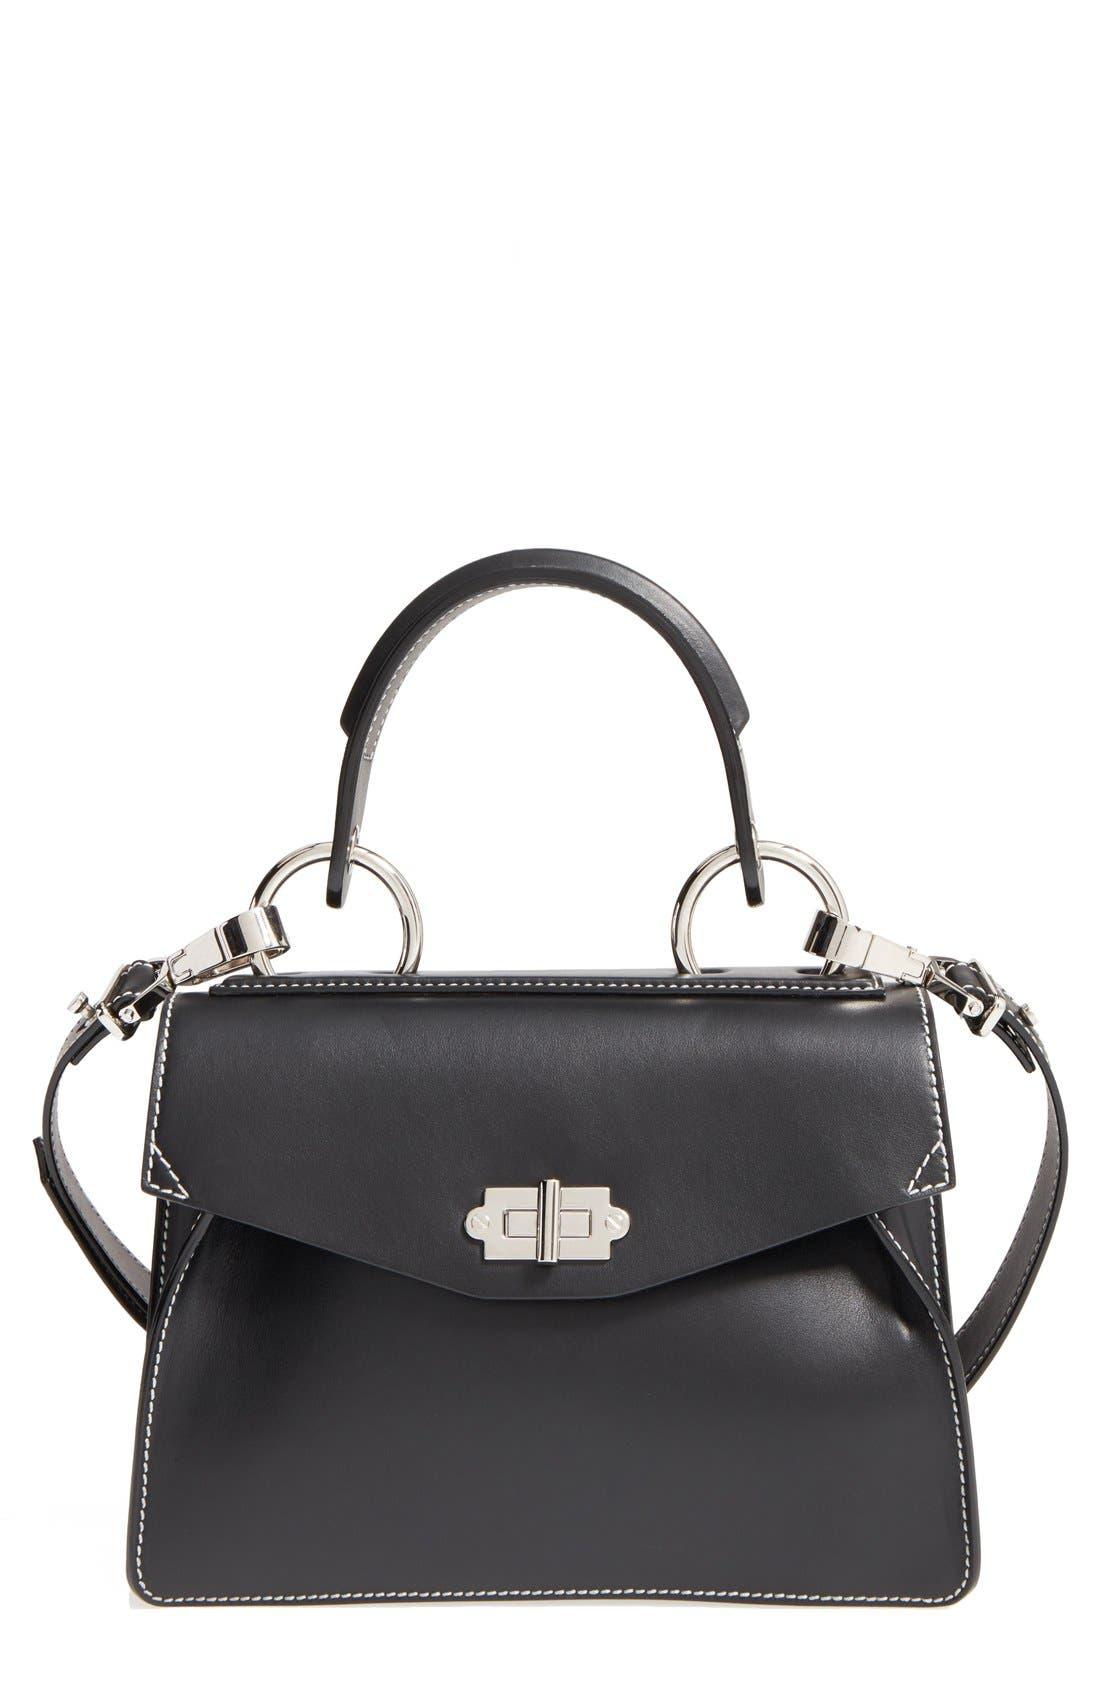 'Small Hava' Top Handle Calfskin Leather Satchel,                         Main,                         color,